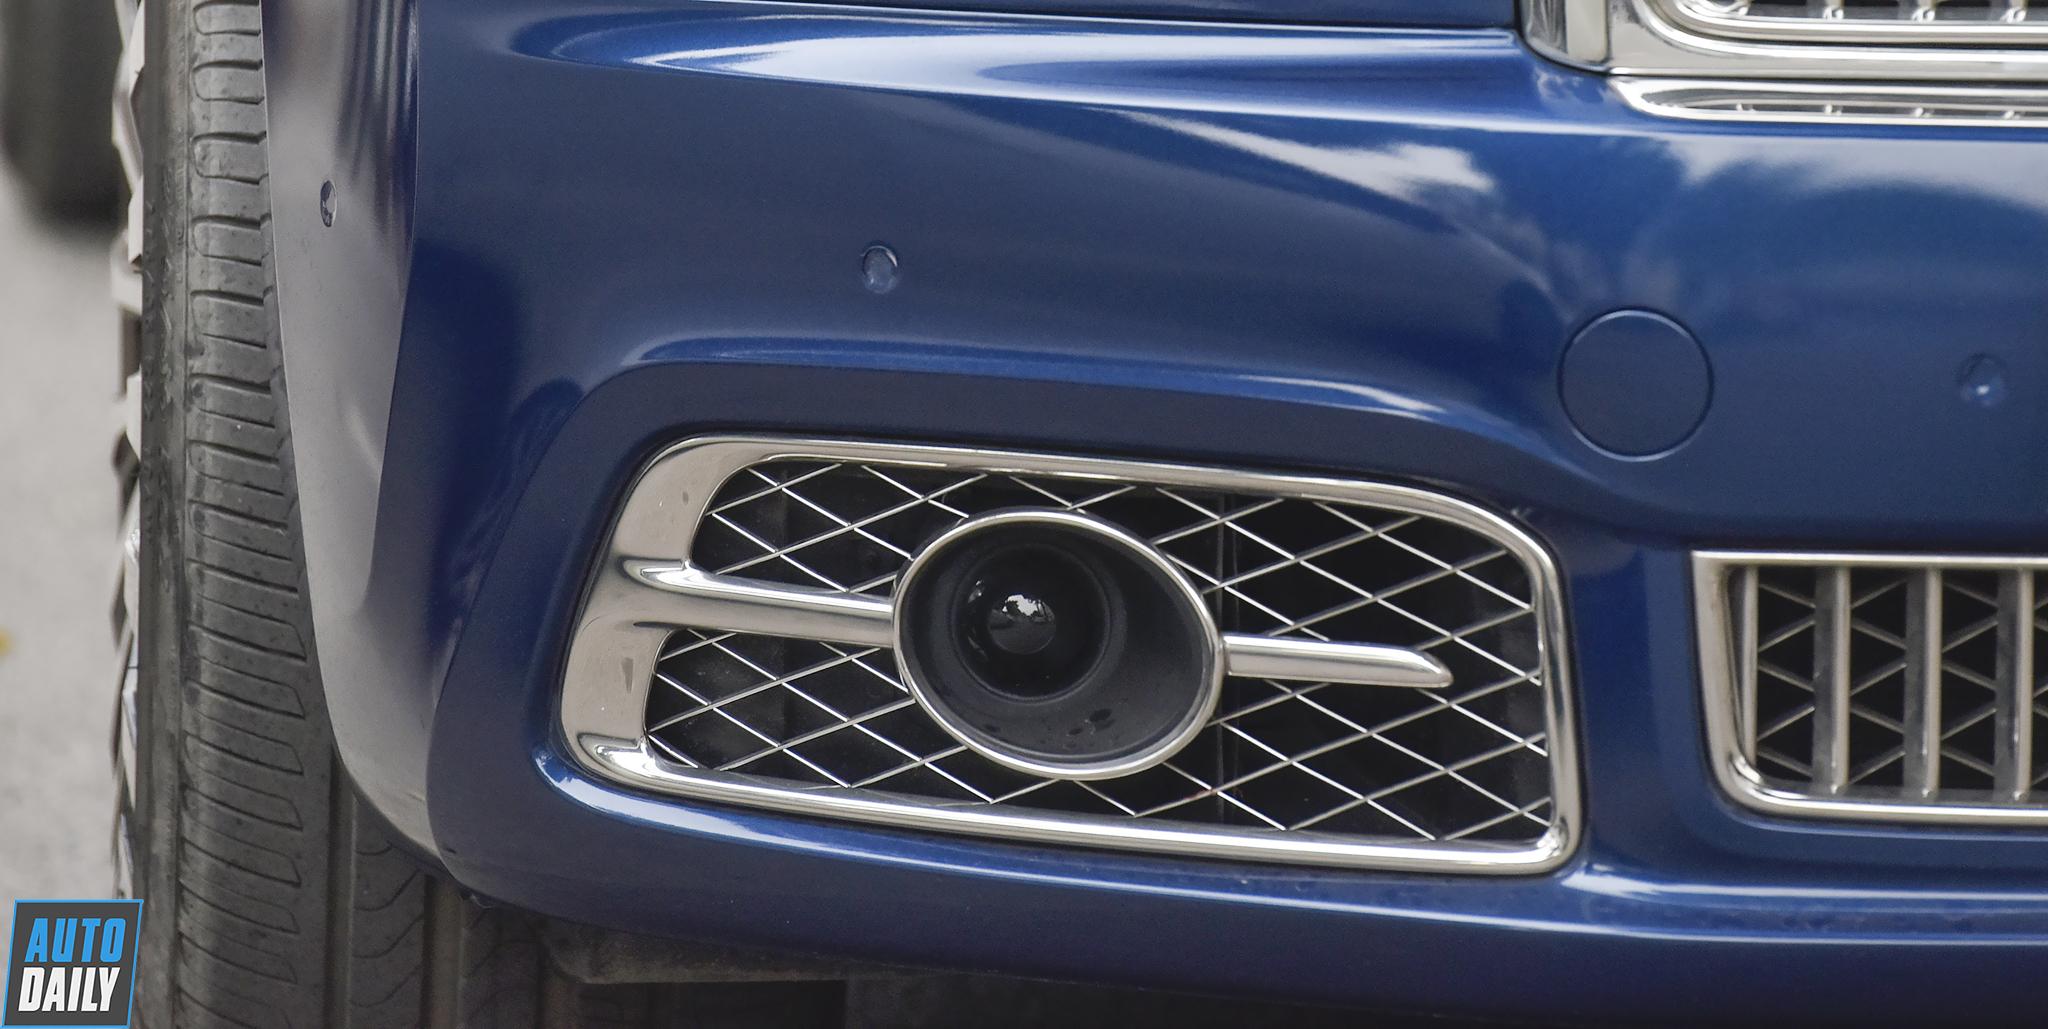 bentley-mulsanne-2018-autodaily-21.jpg